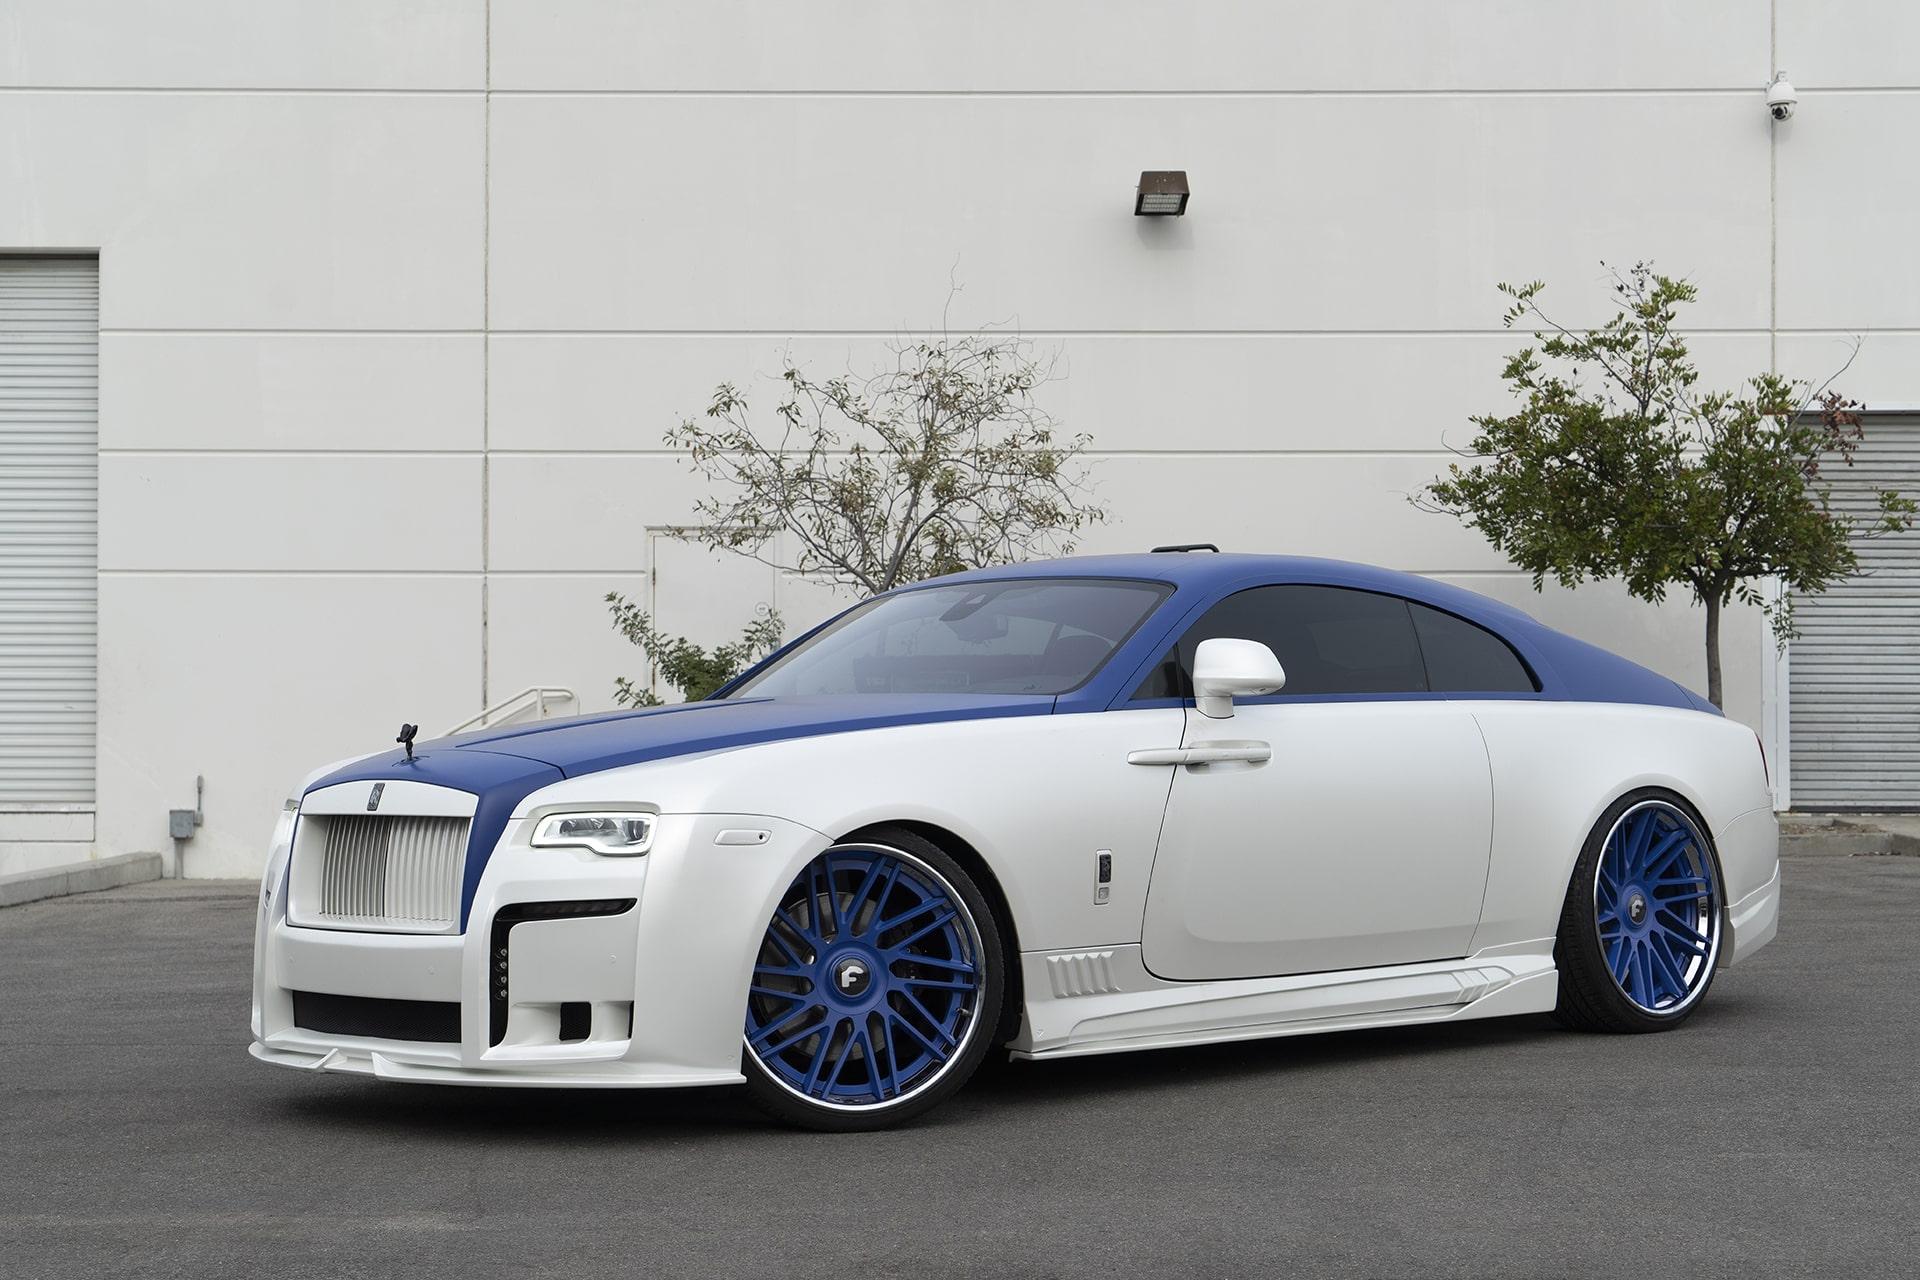 Rolls Royce Dealers >> ROLLS ROYCE WRAITH   フォージアートジャパン